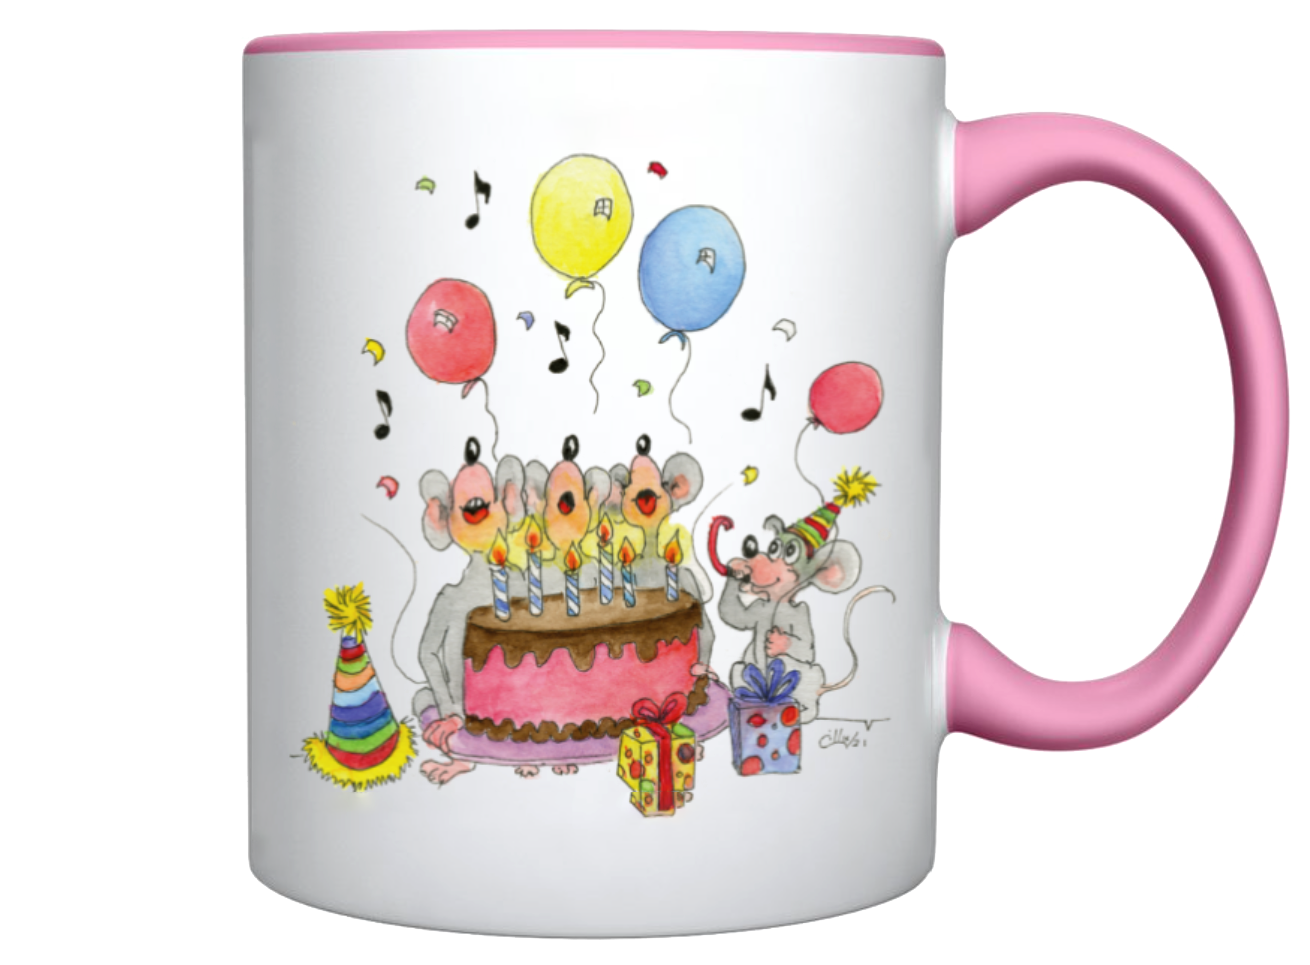 three_Mice_singing_Birthday_Cake_Coffee_Cup_Sample_J-INK